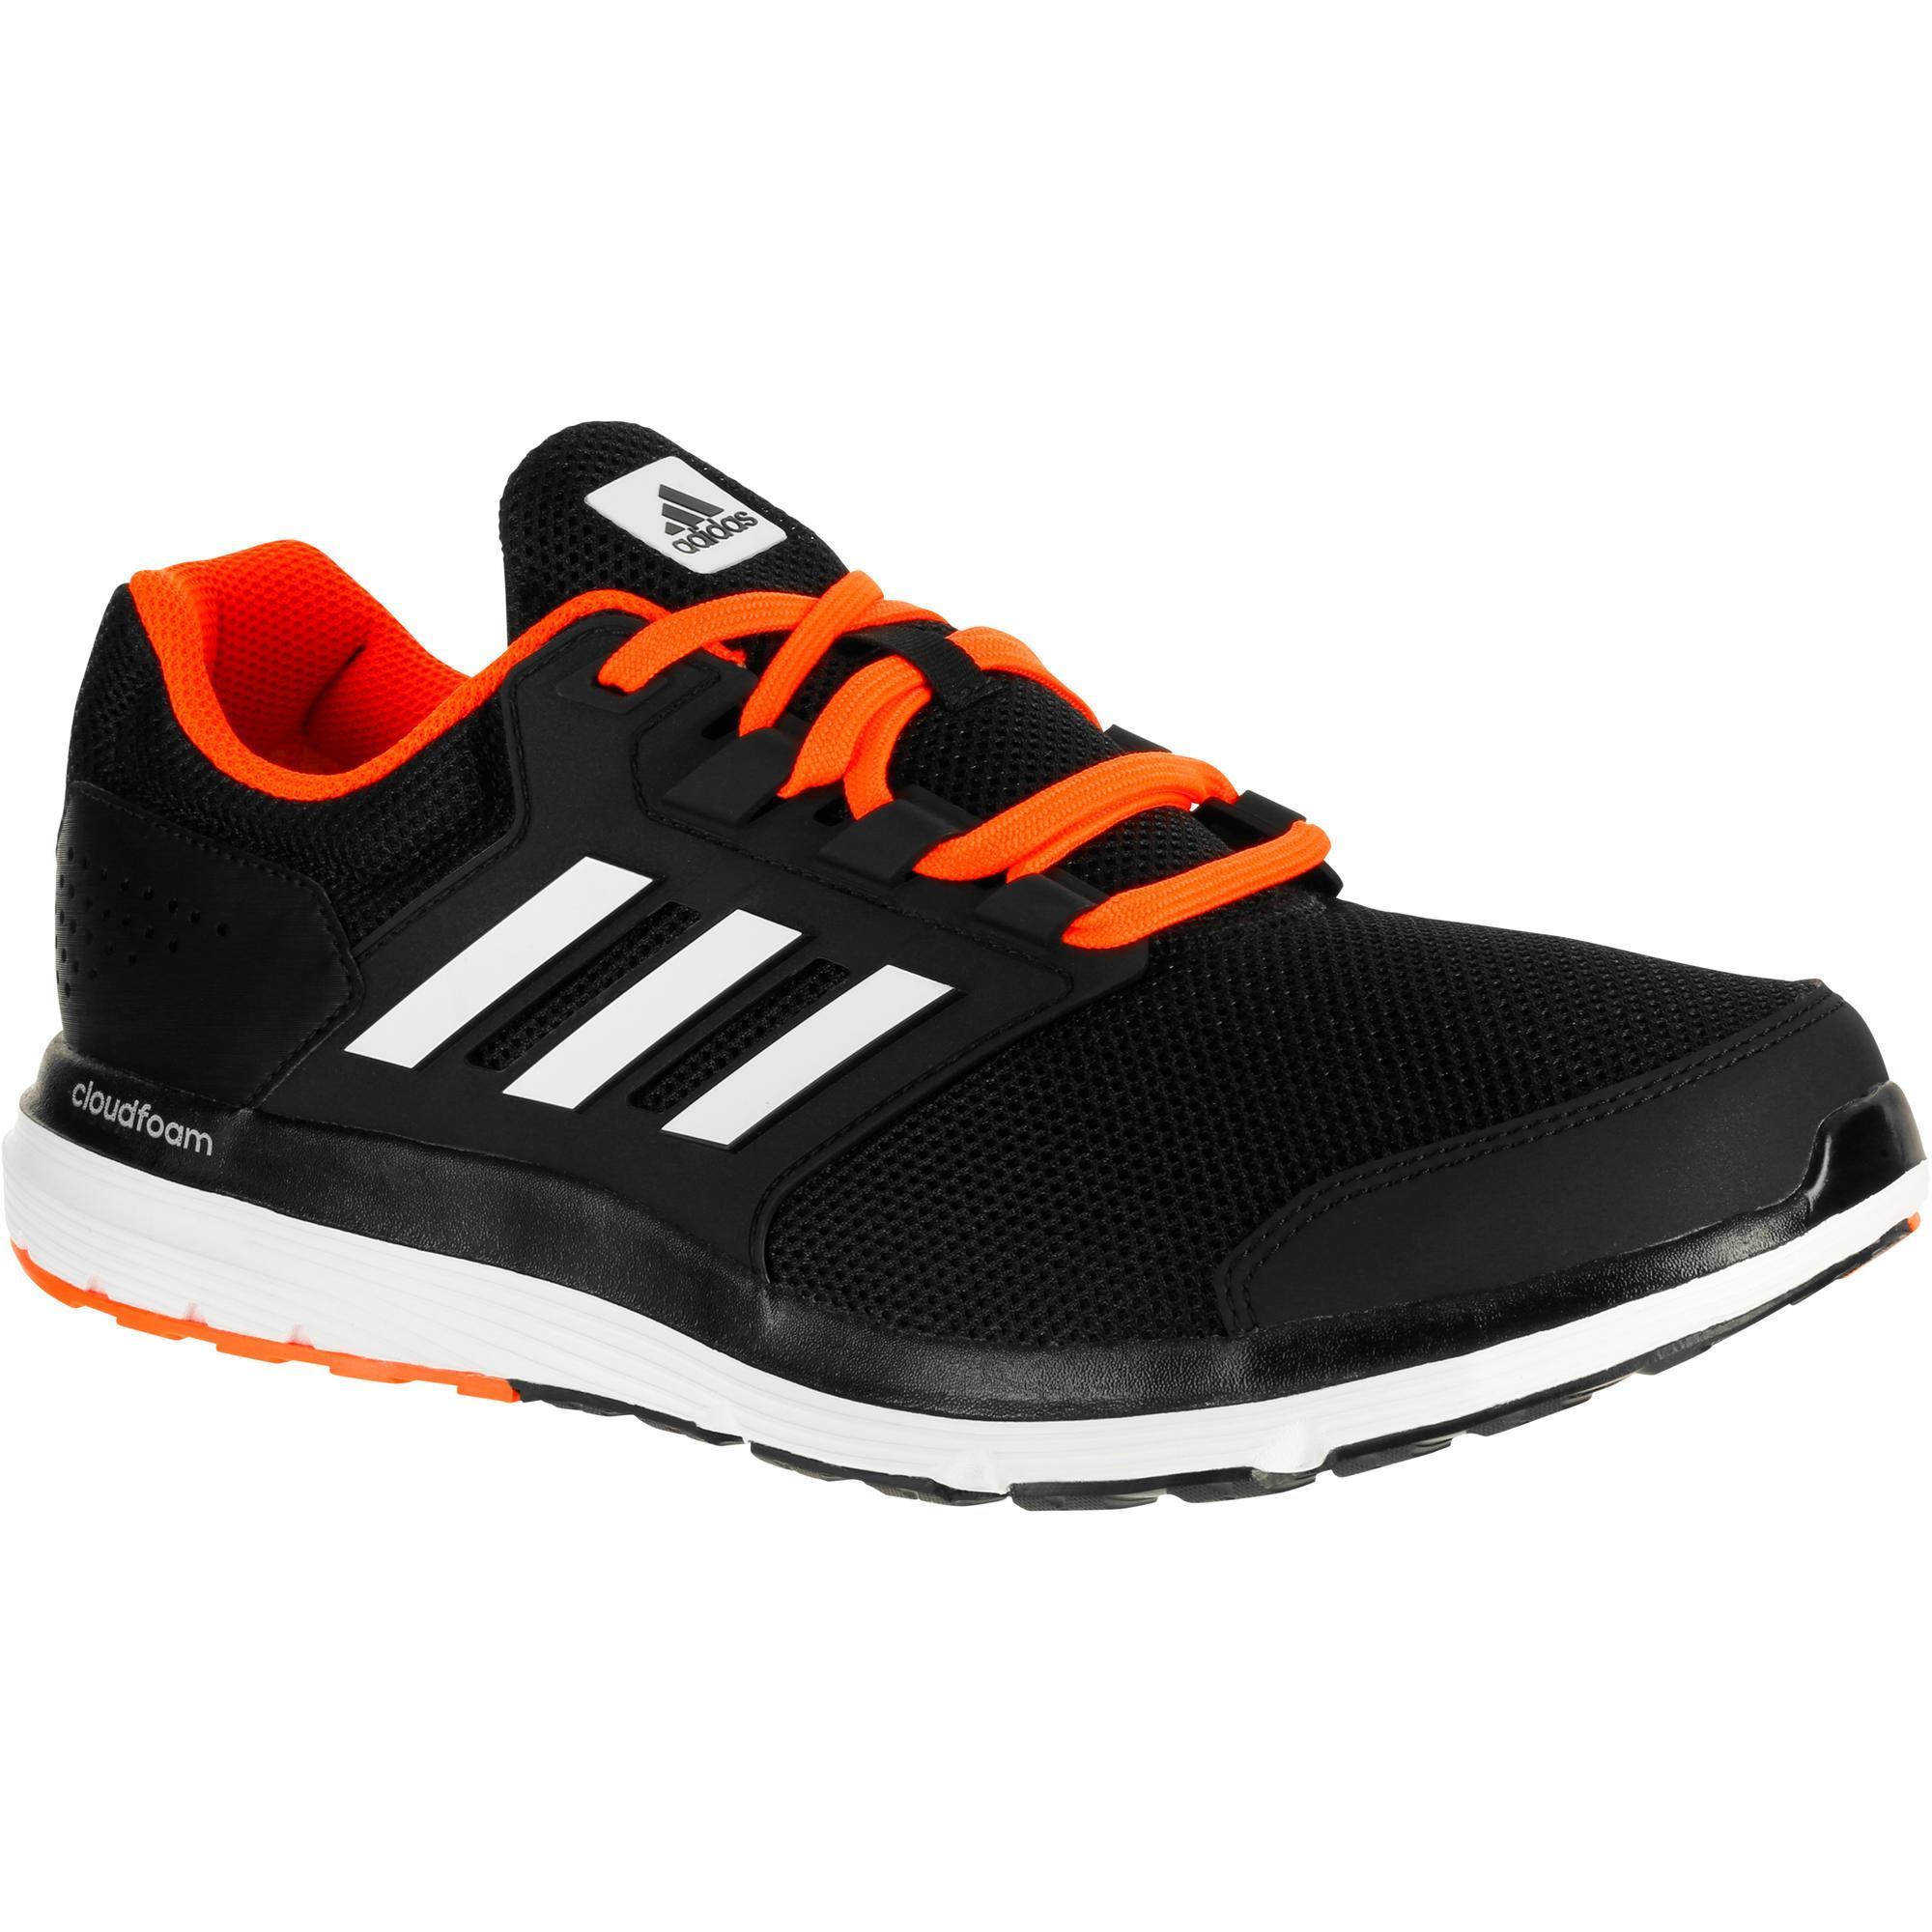 brand new bb98e 5b6ed ZAPATILLAS JOGGING RUNNING ADIDAS GALAXY 4 HOMBRE NEGRO Adidas  Decathlon